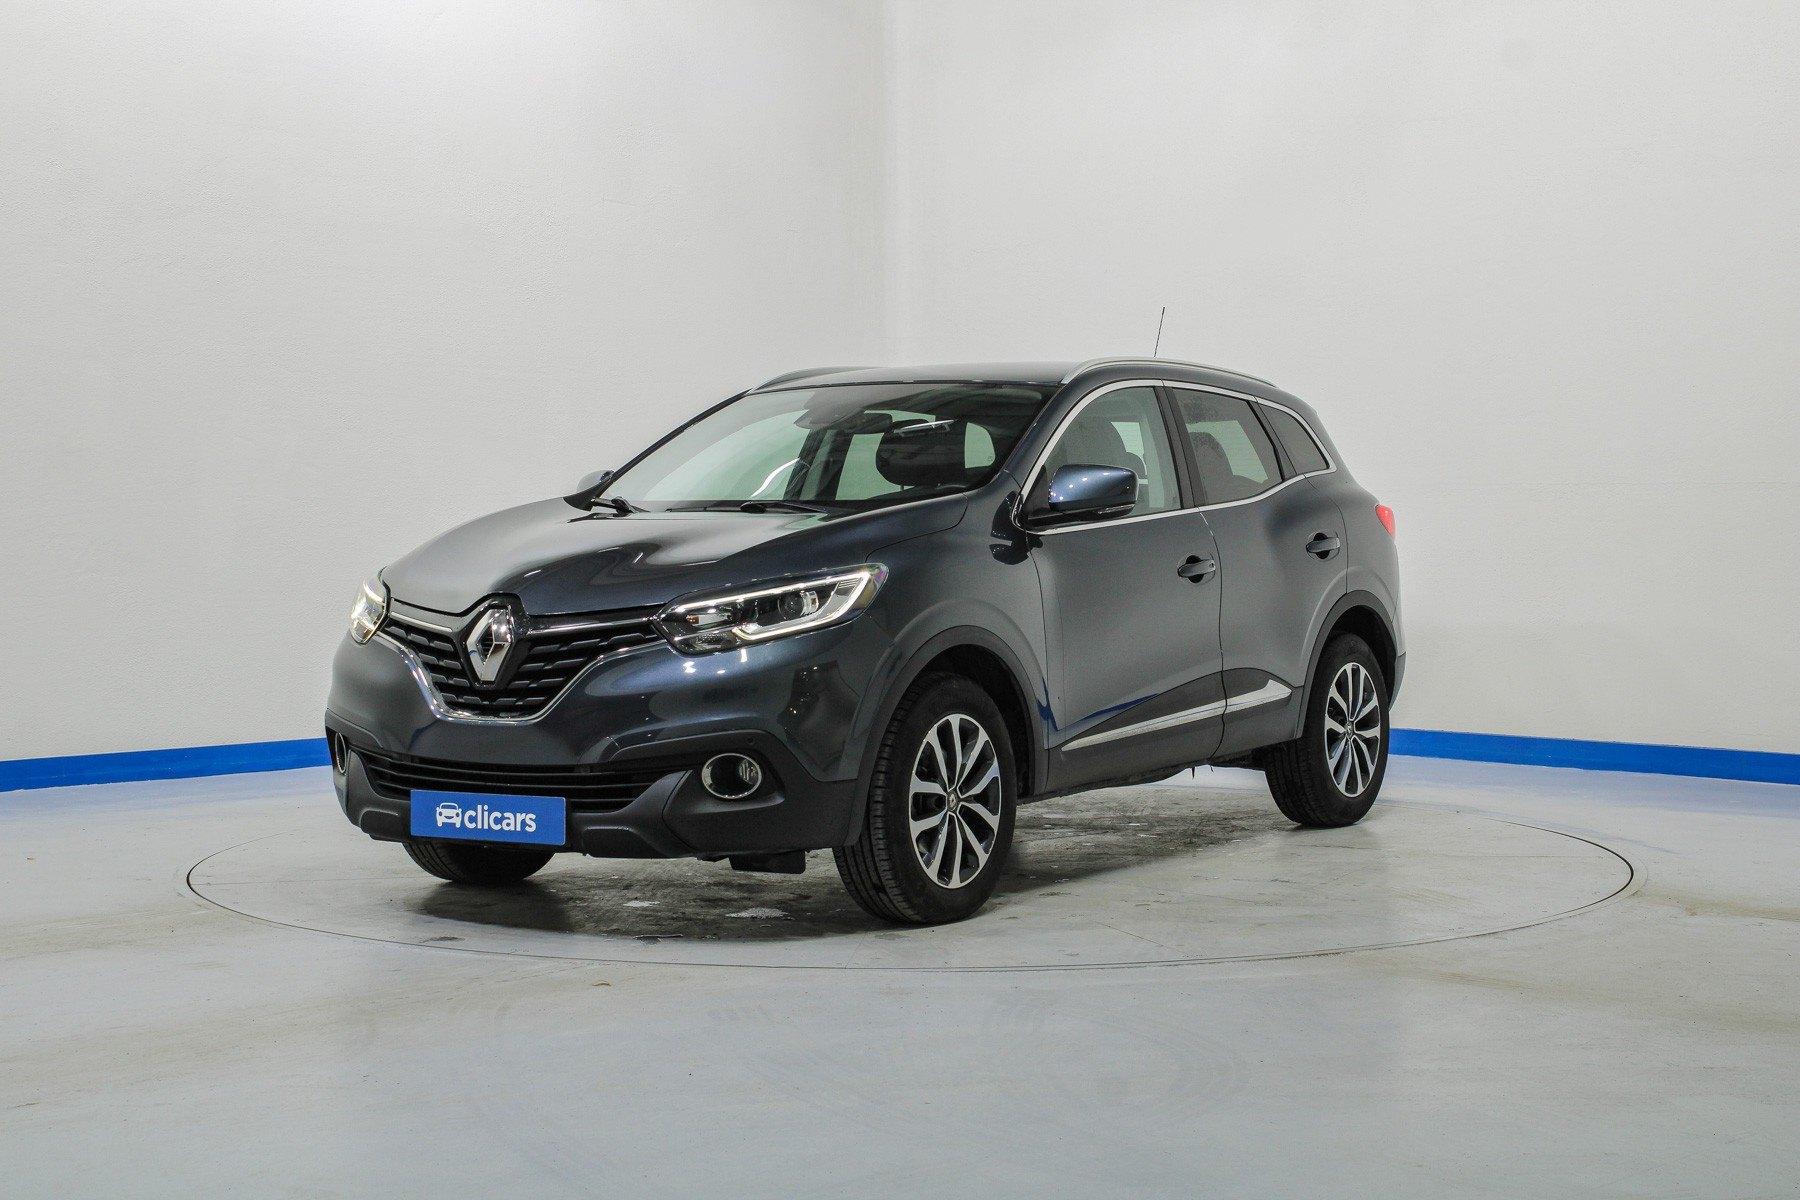 Renault Kadjar Gasolina Life Energy TCe 97kW (130CV) 1